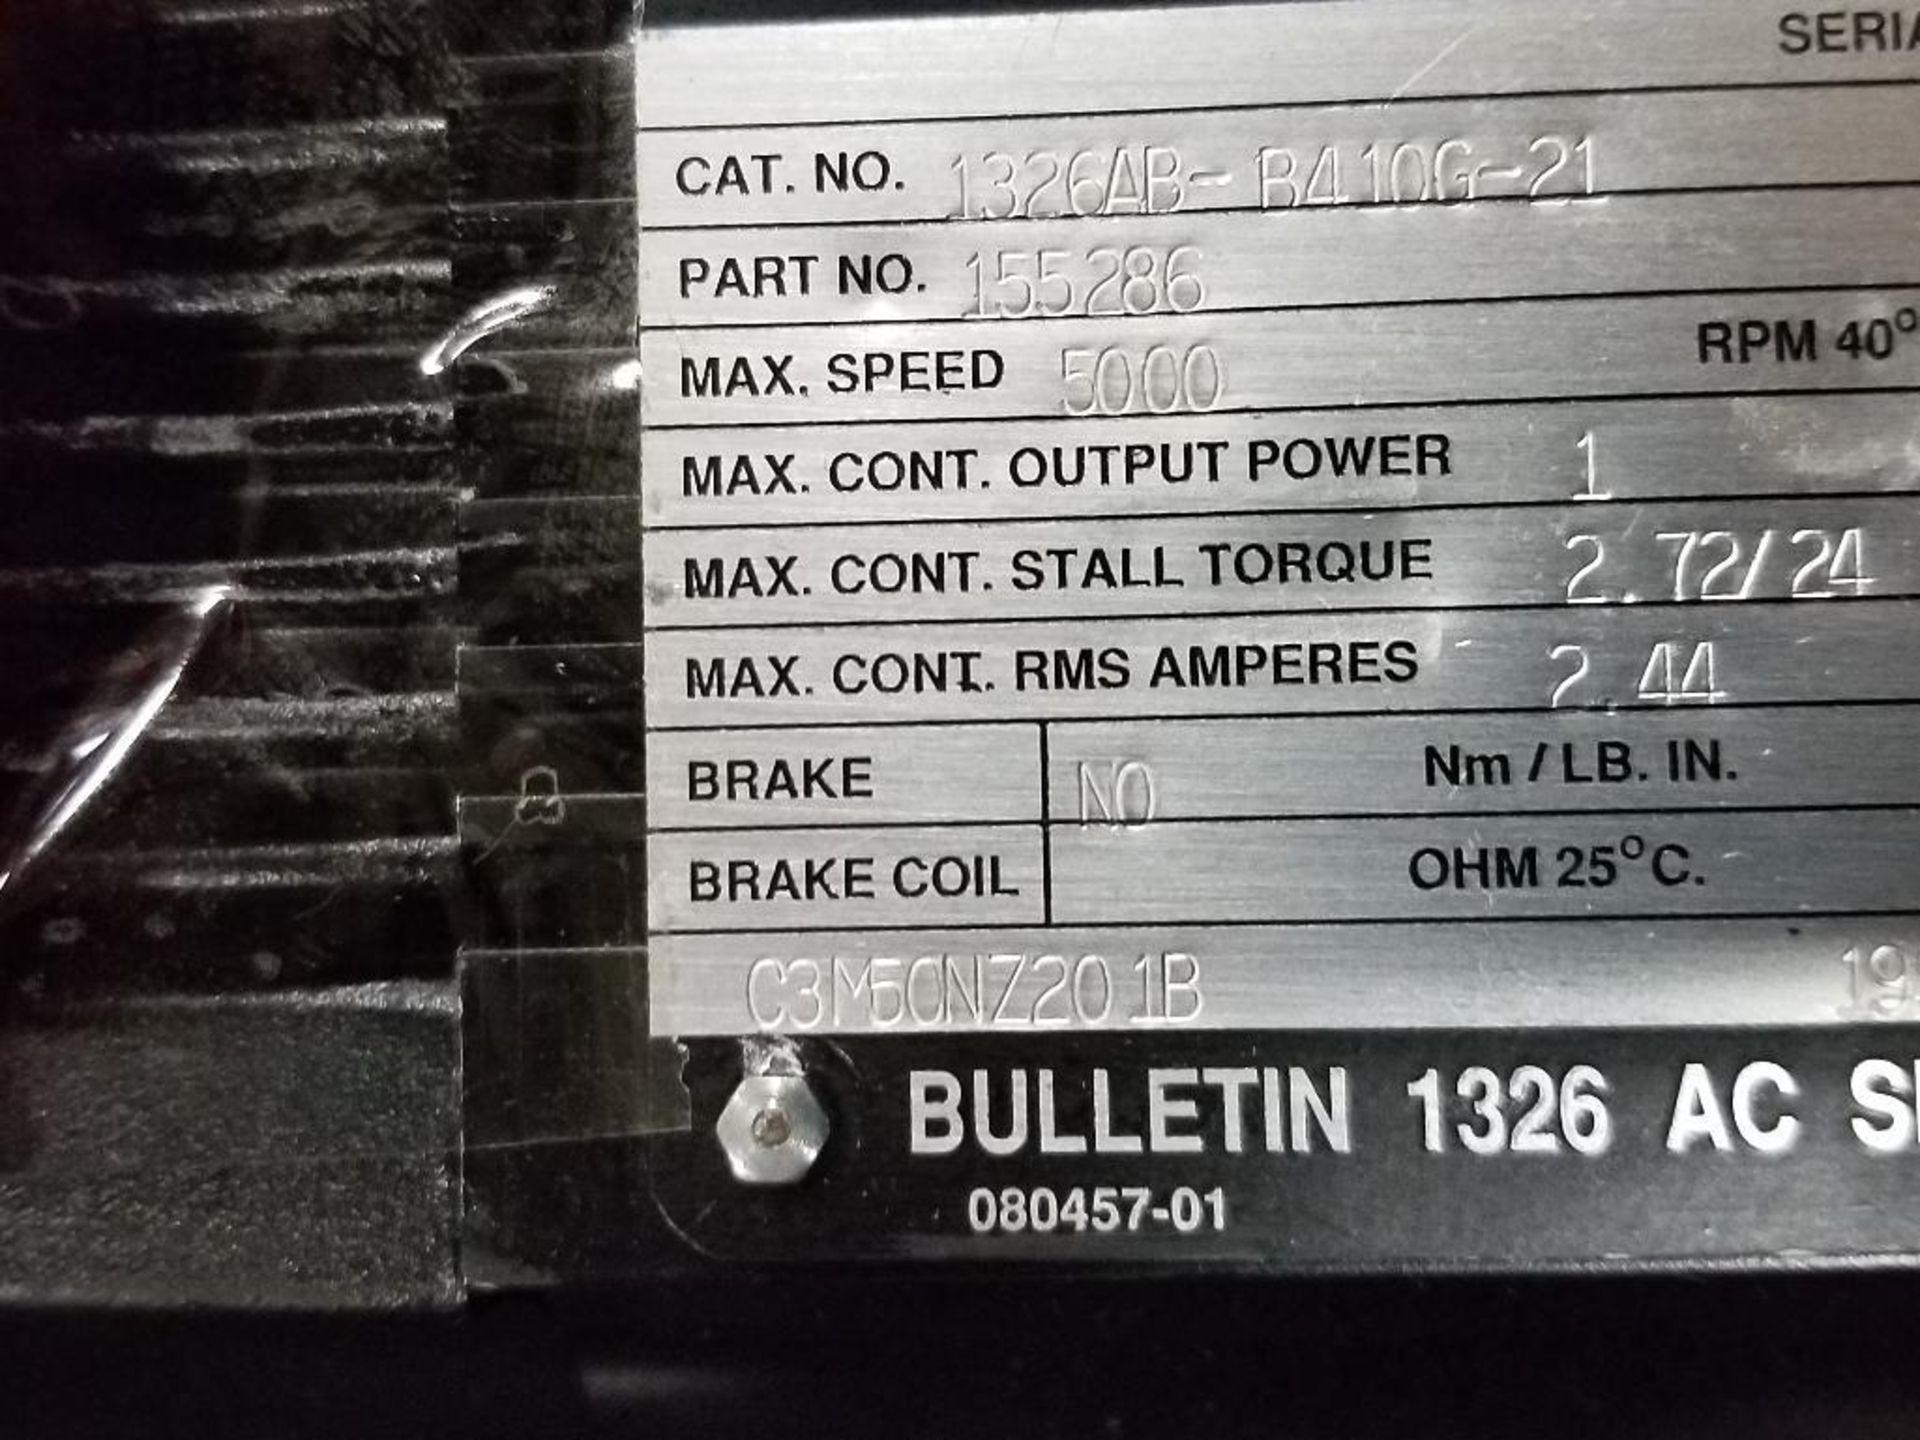 1kW Allen Bradley servo motor. Cat# 1326AB-B410G-21, Part# 155286, 5000RPM. - Image 6 of 6